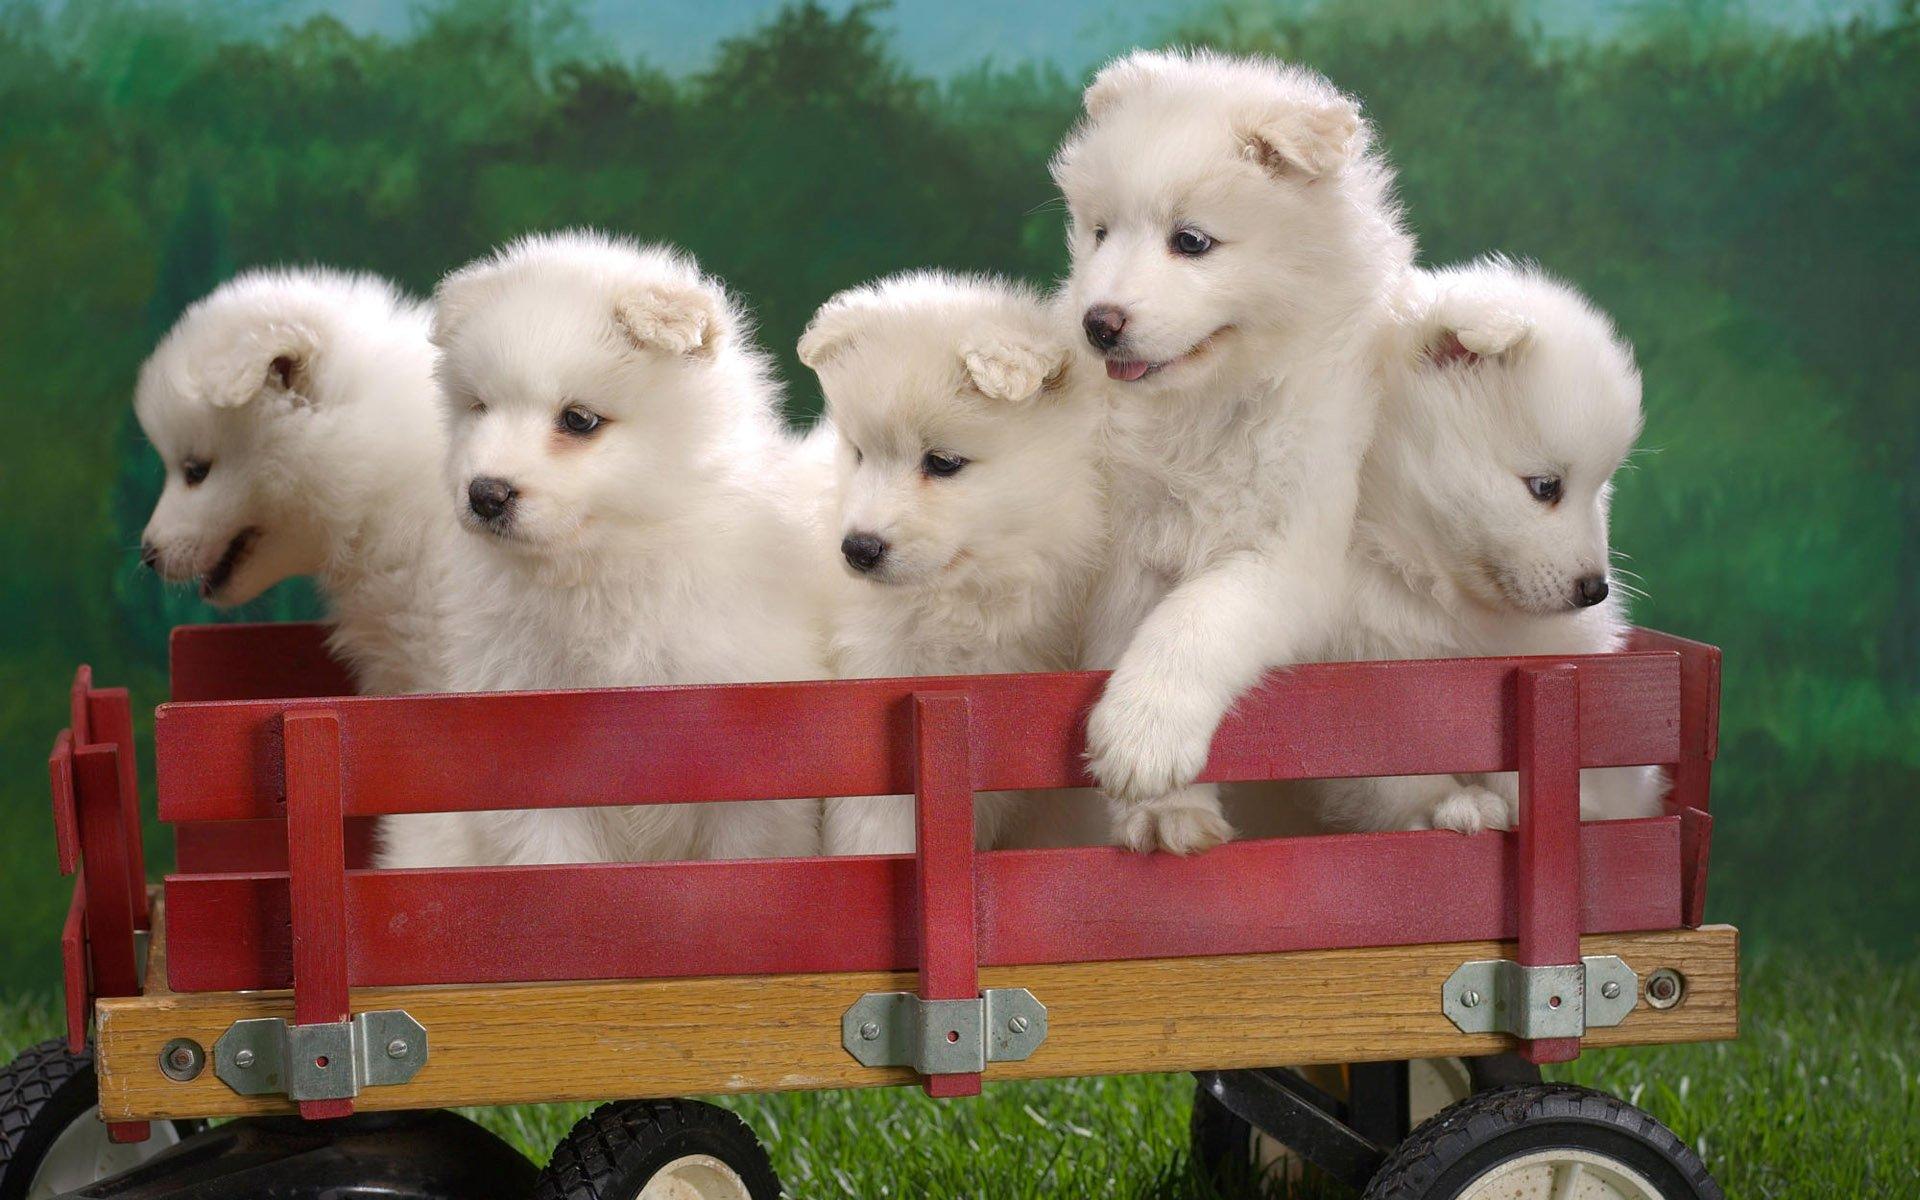 Cute White Puppies Hd Wallpaper